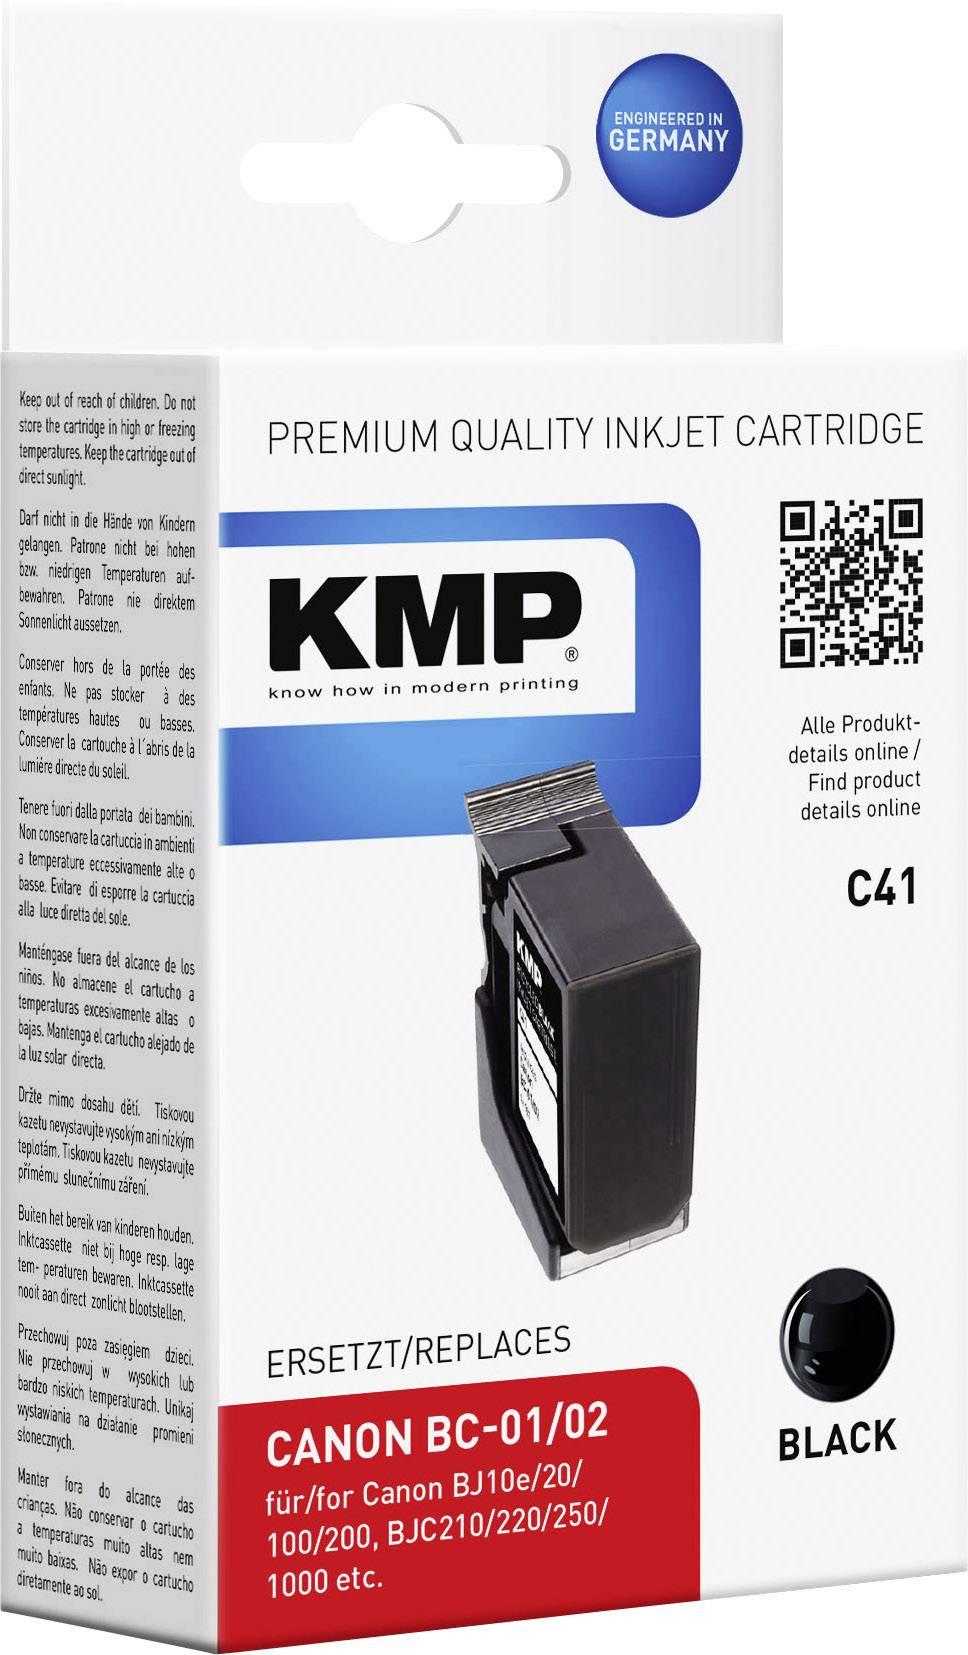 Toner inject KMP C41 = CANON BC-02 černá